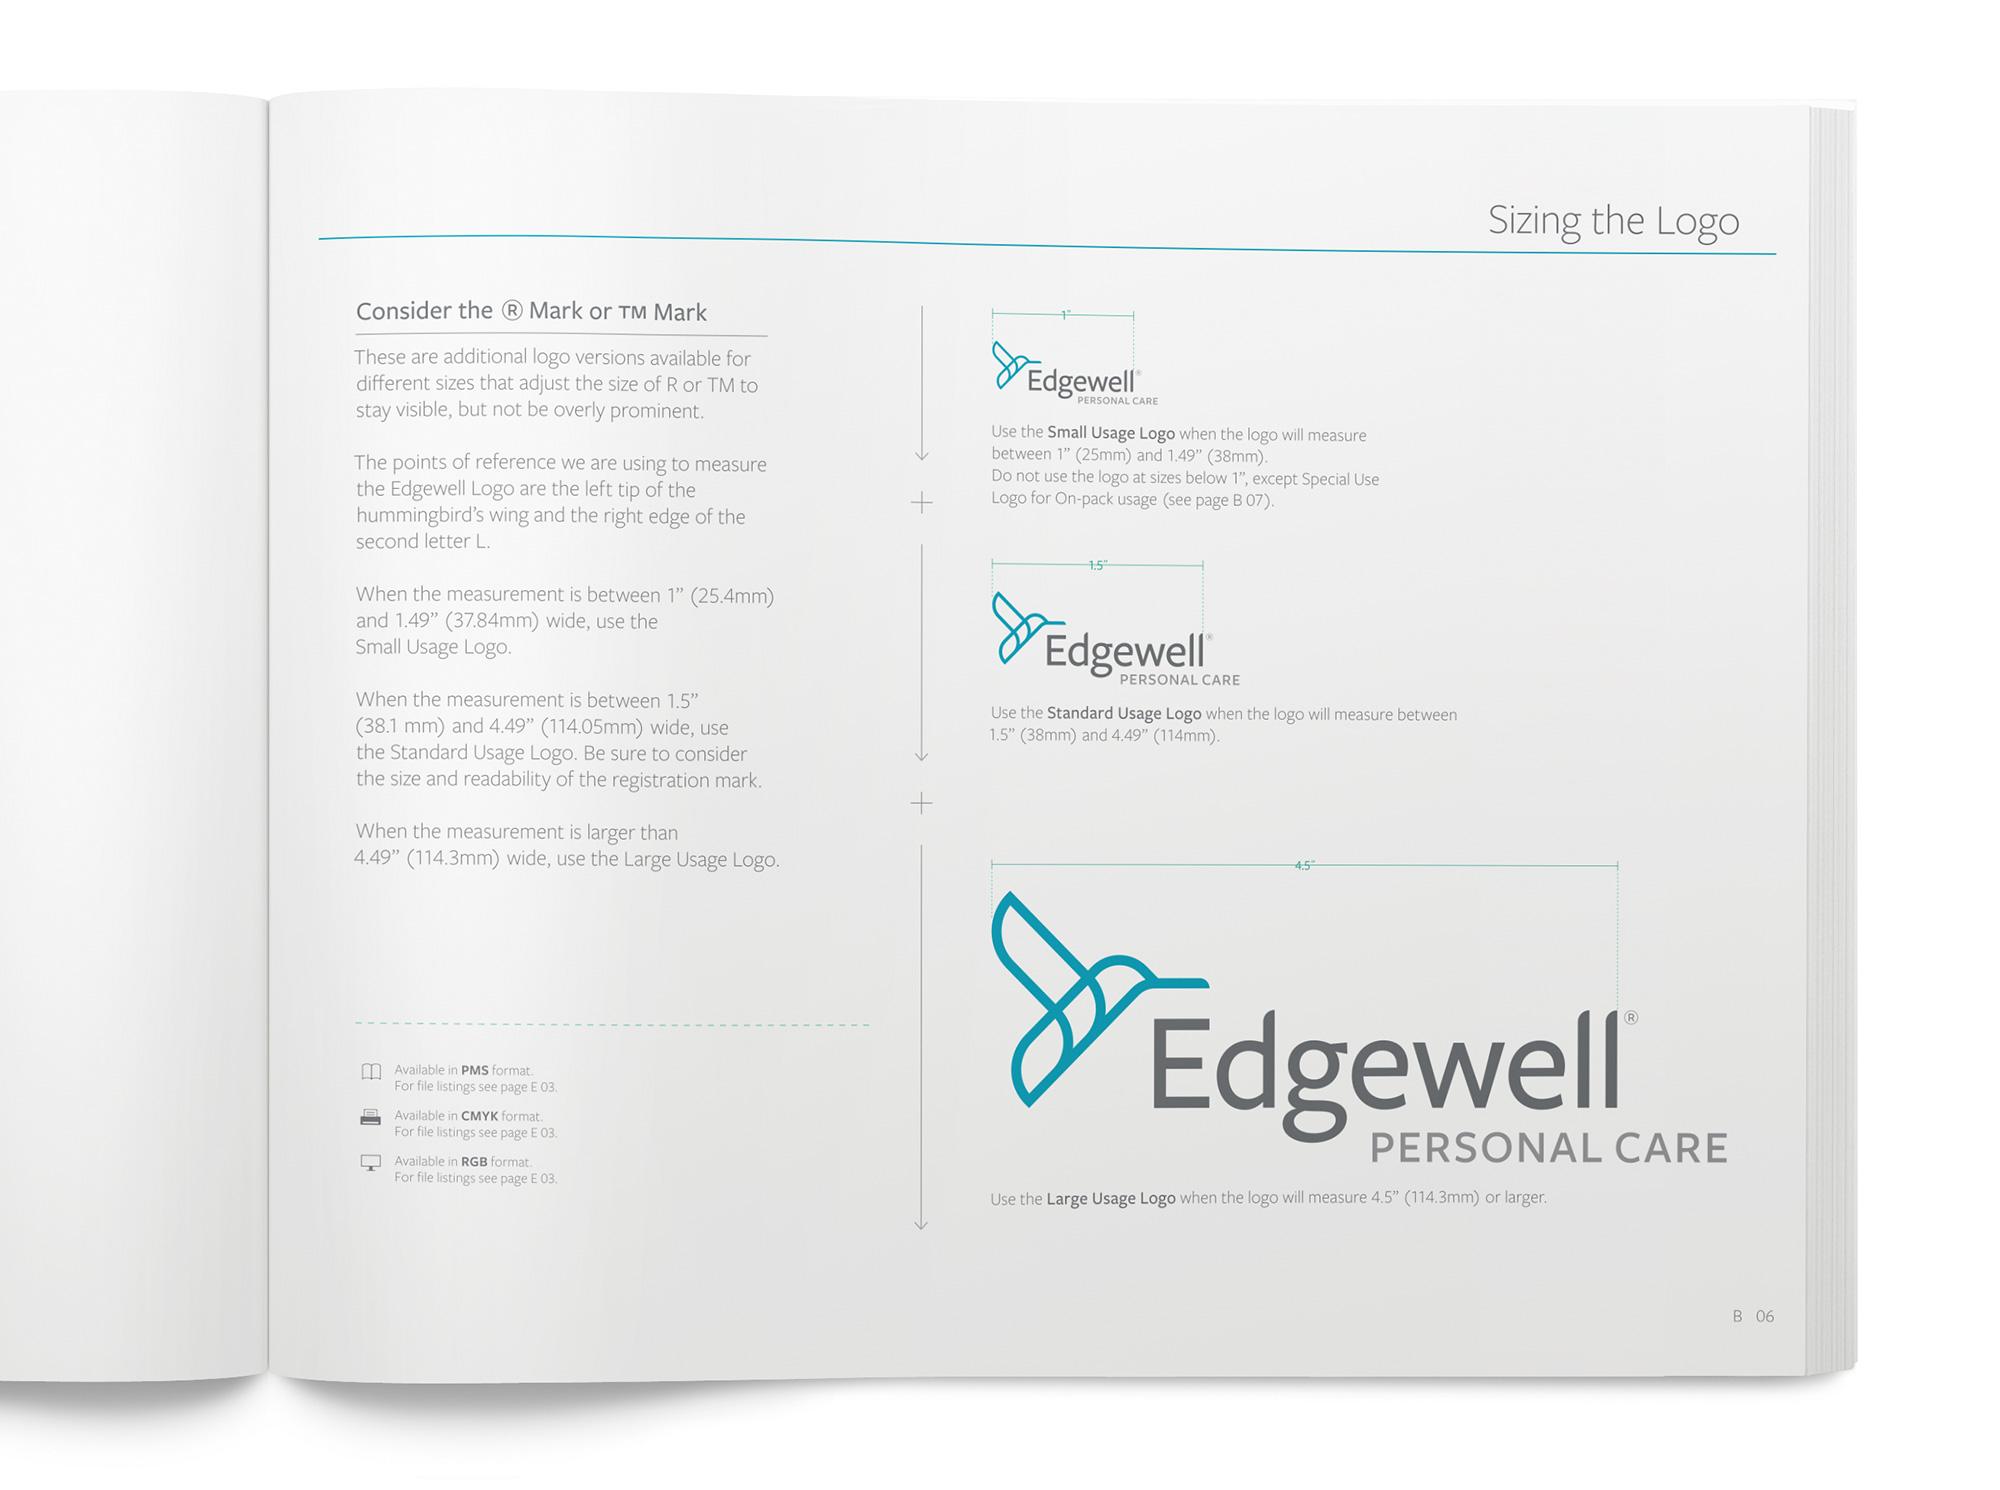 Edgewell-Guidelines-2015_0608-2